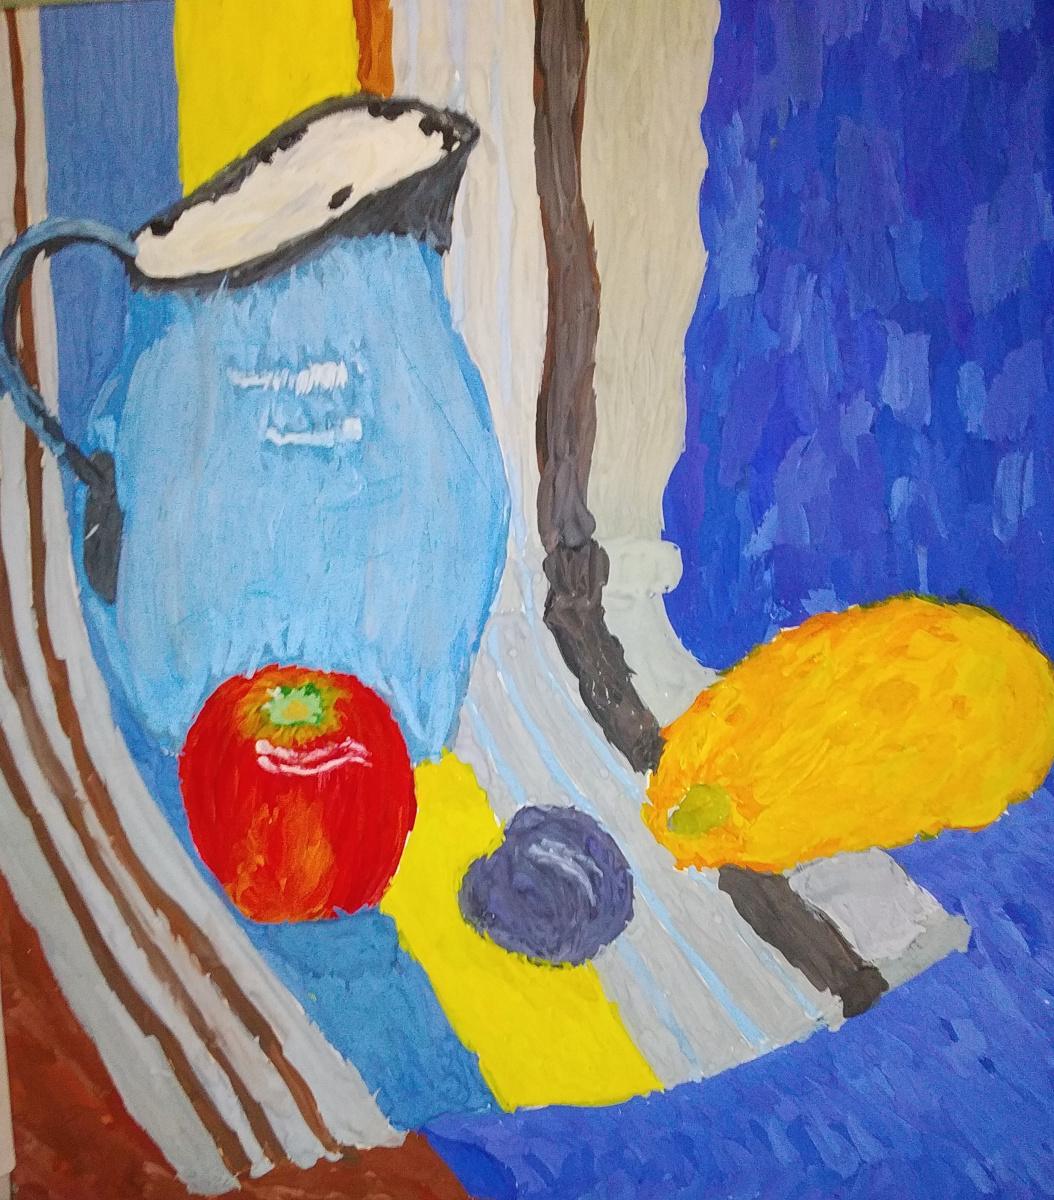 Zina Vladimirovna Parisva. Still life with lemon